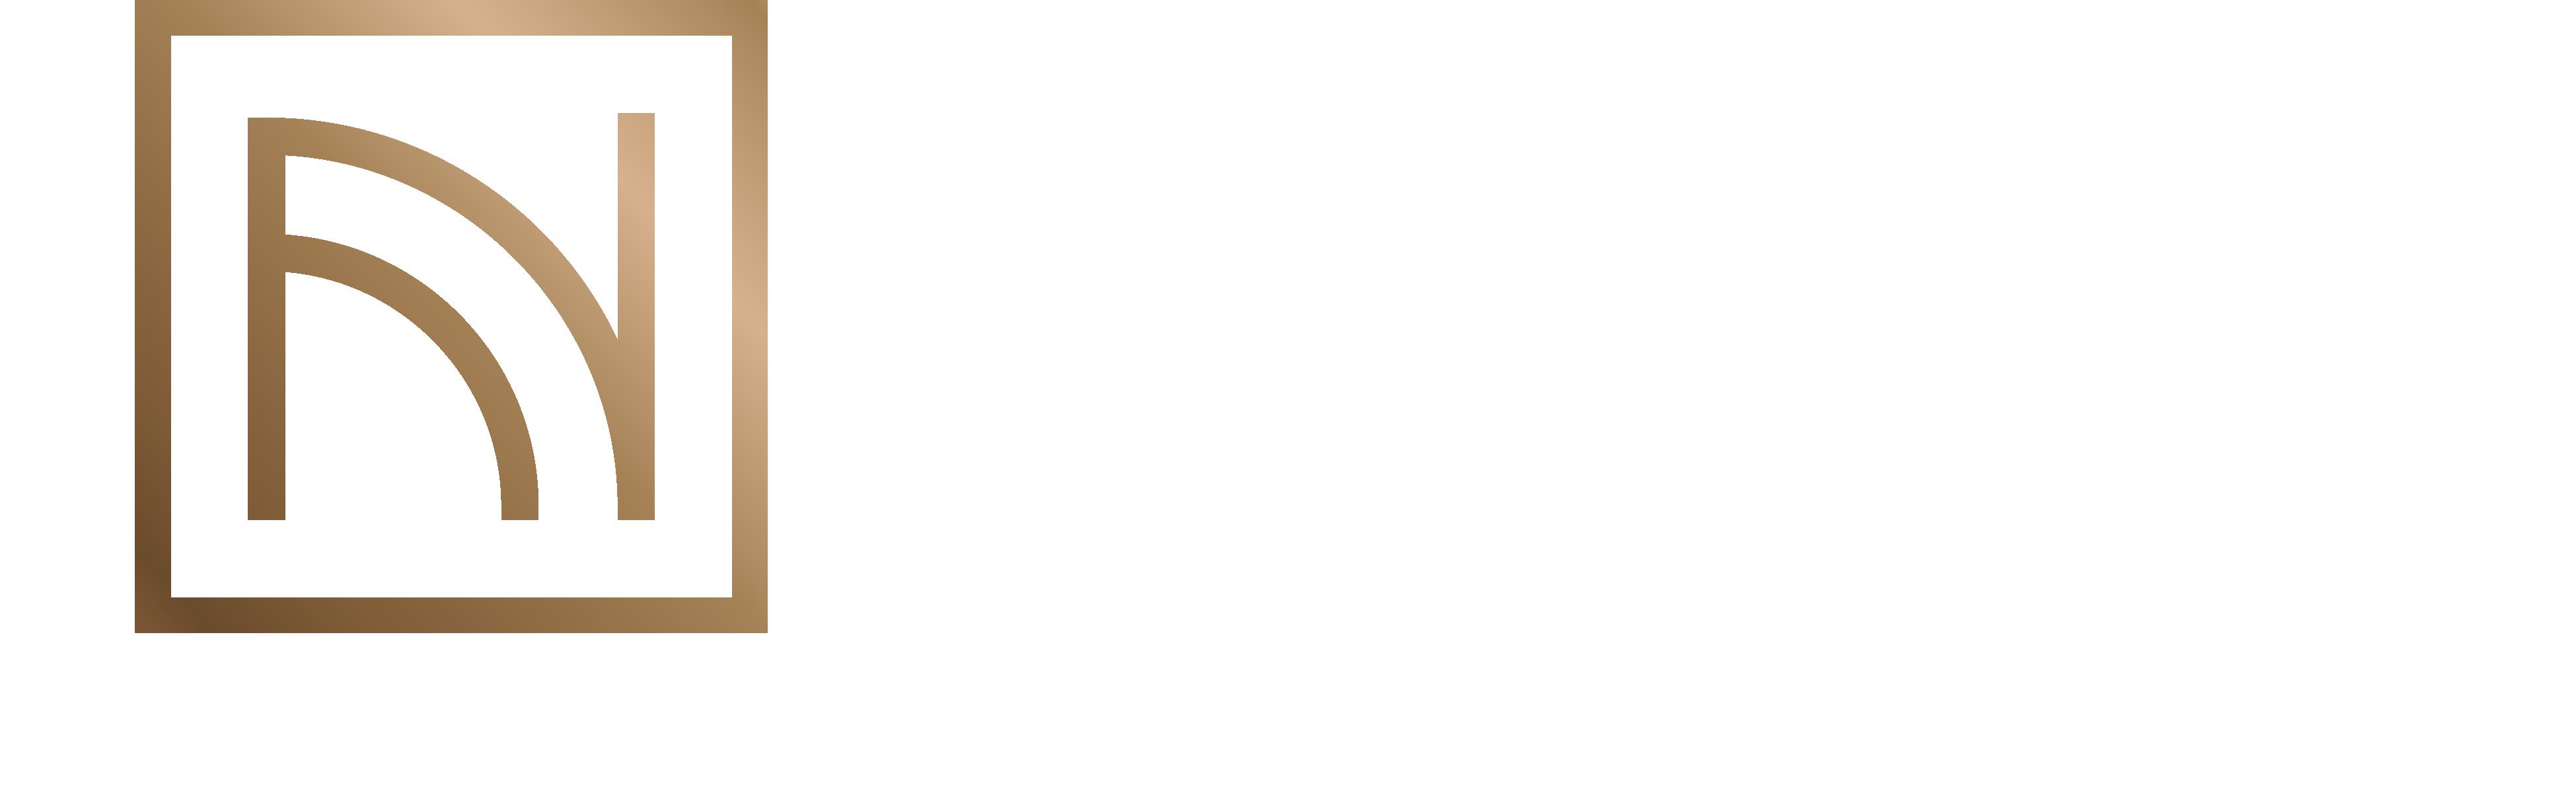 INCASE Fux – International Careful Art Services Logo